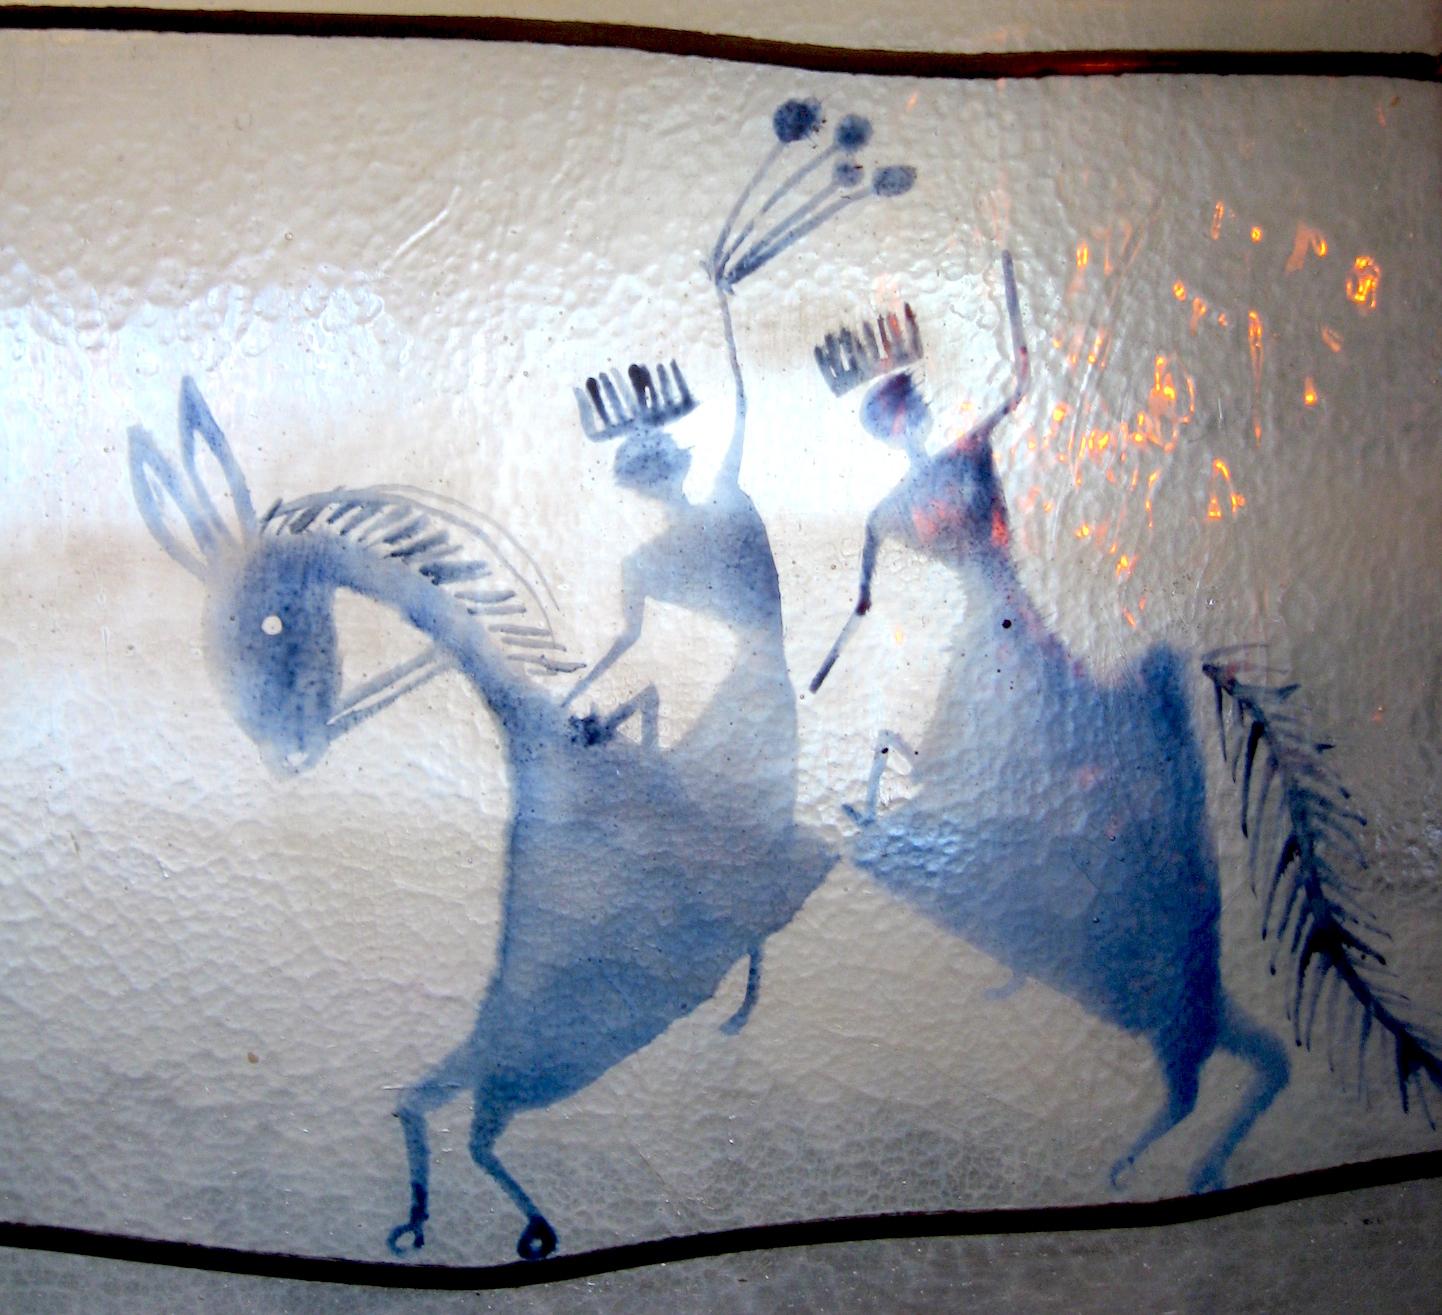 vetrata-particolare-indiani-blujpg.jpg